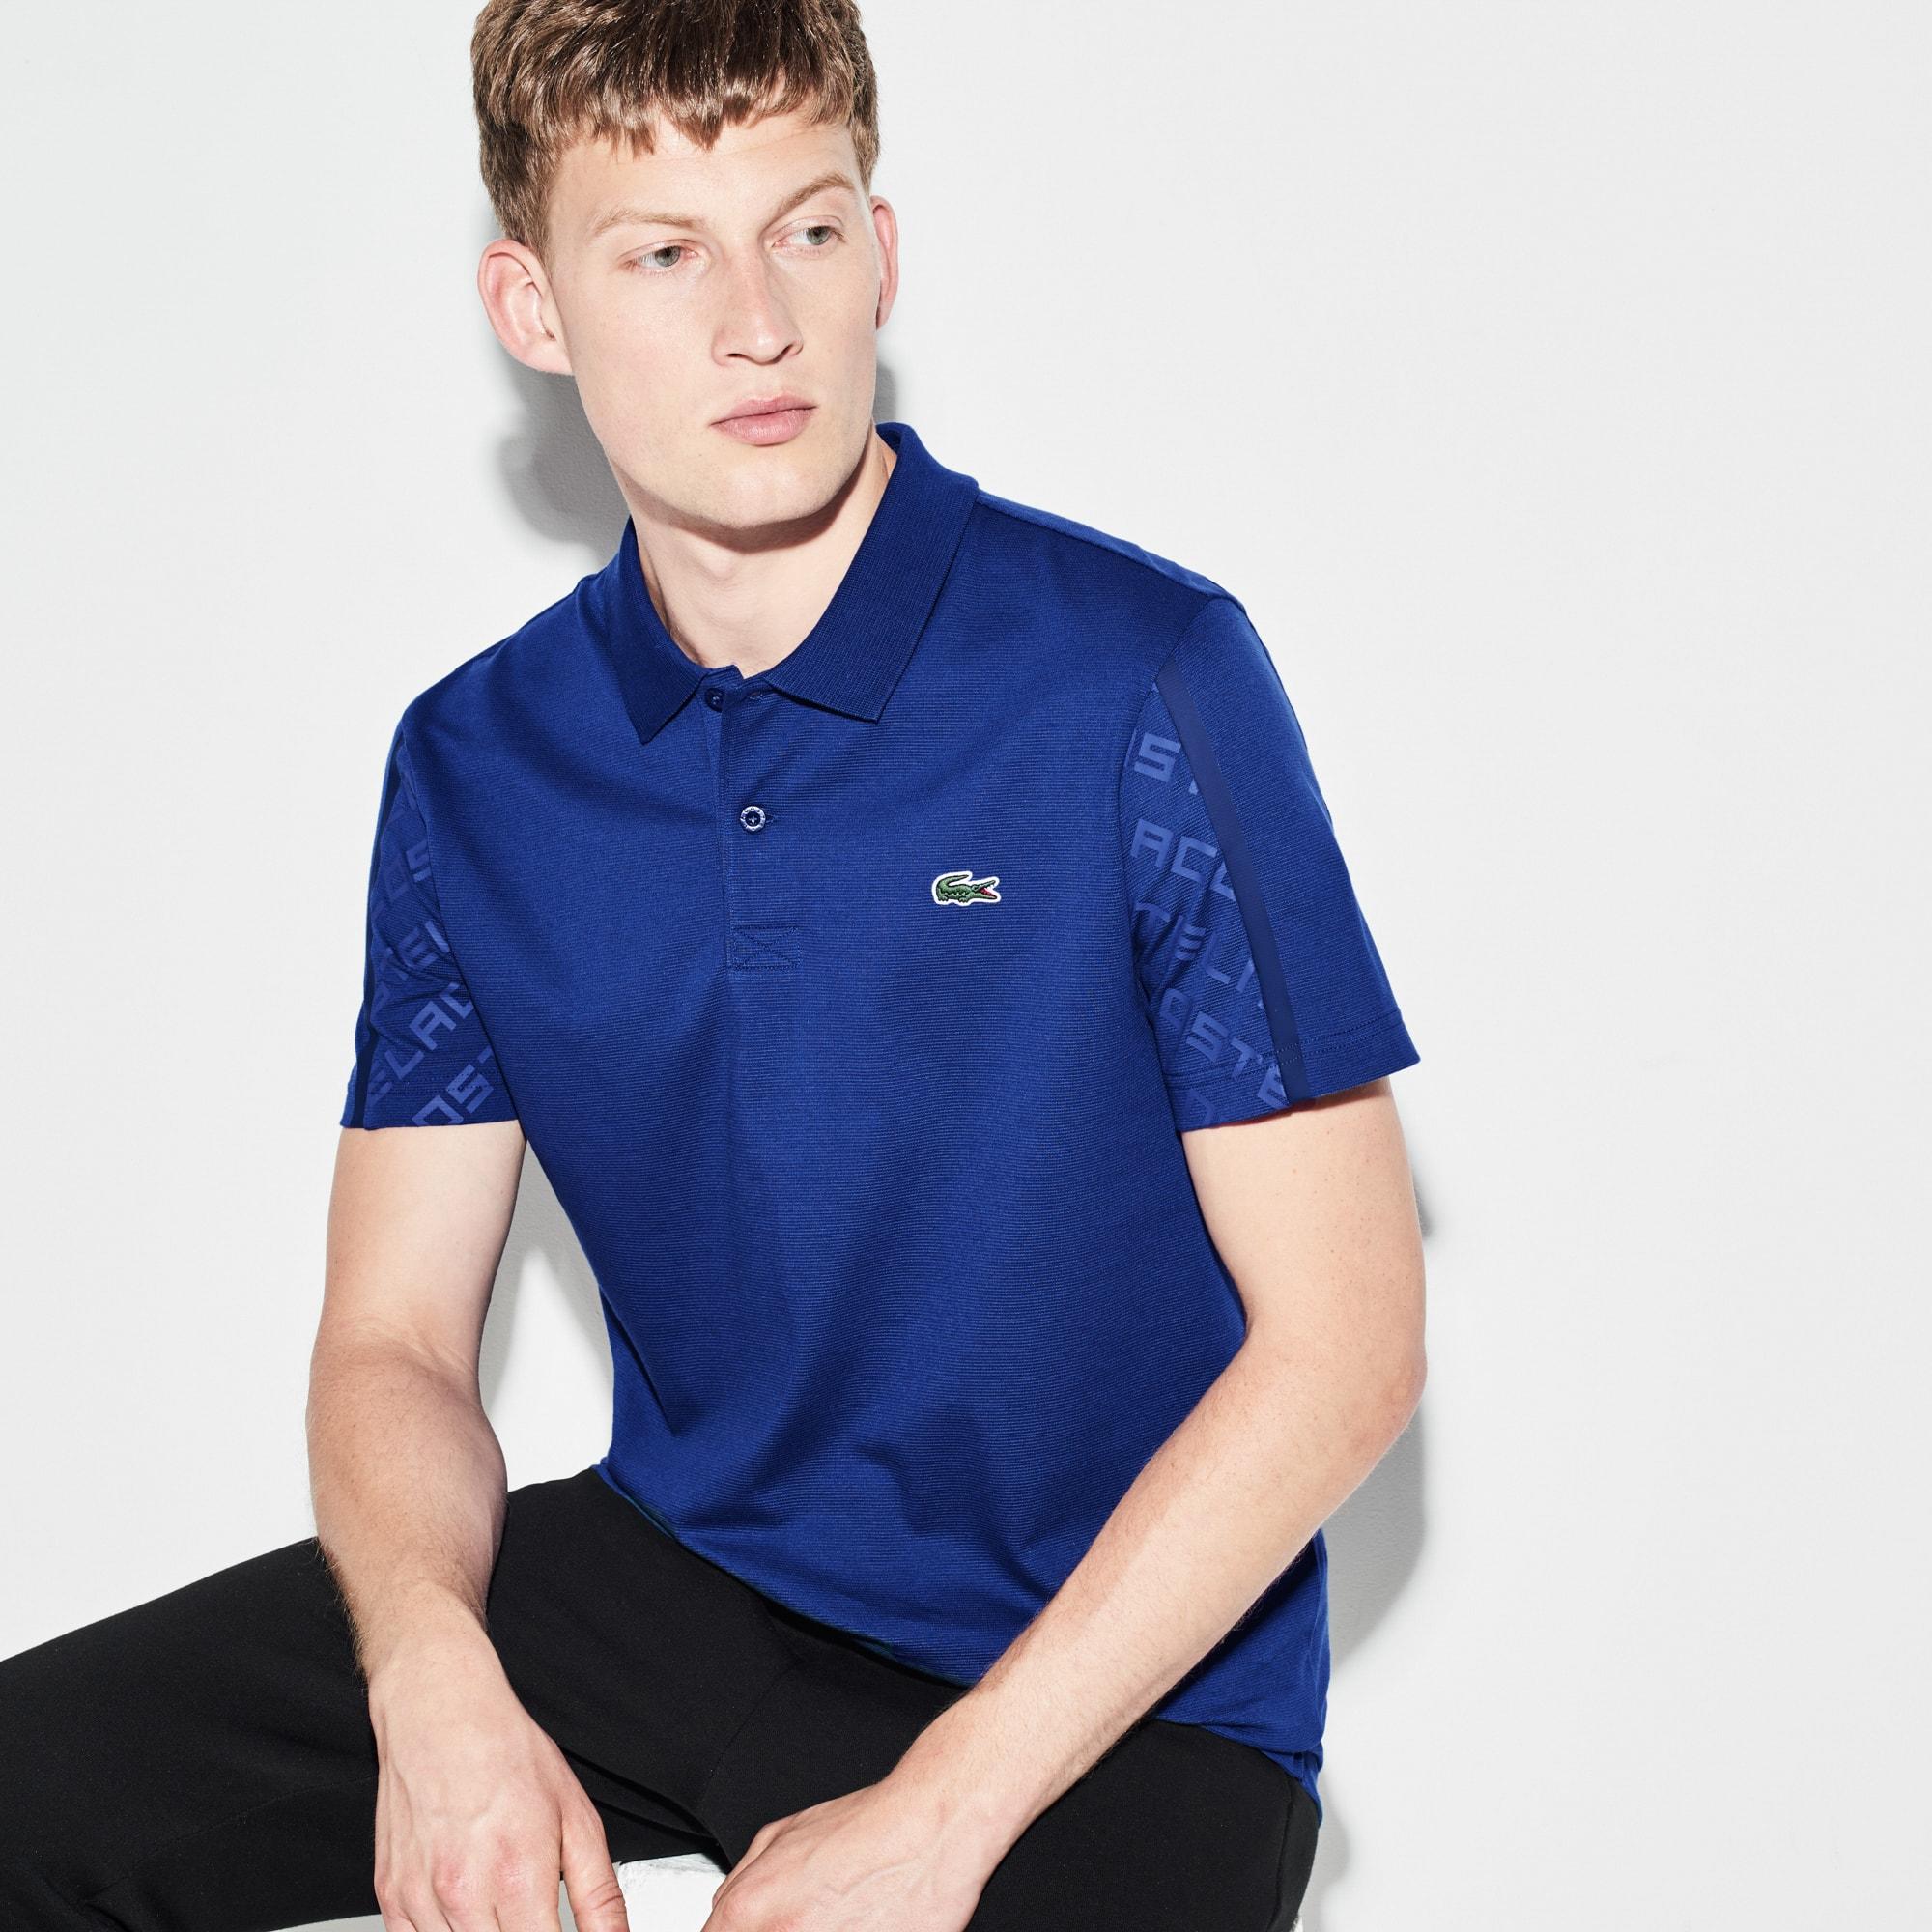 Men's  SPORT Tennis Print Sleeves Lightweight Knit Polo